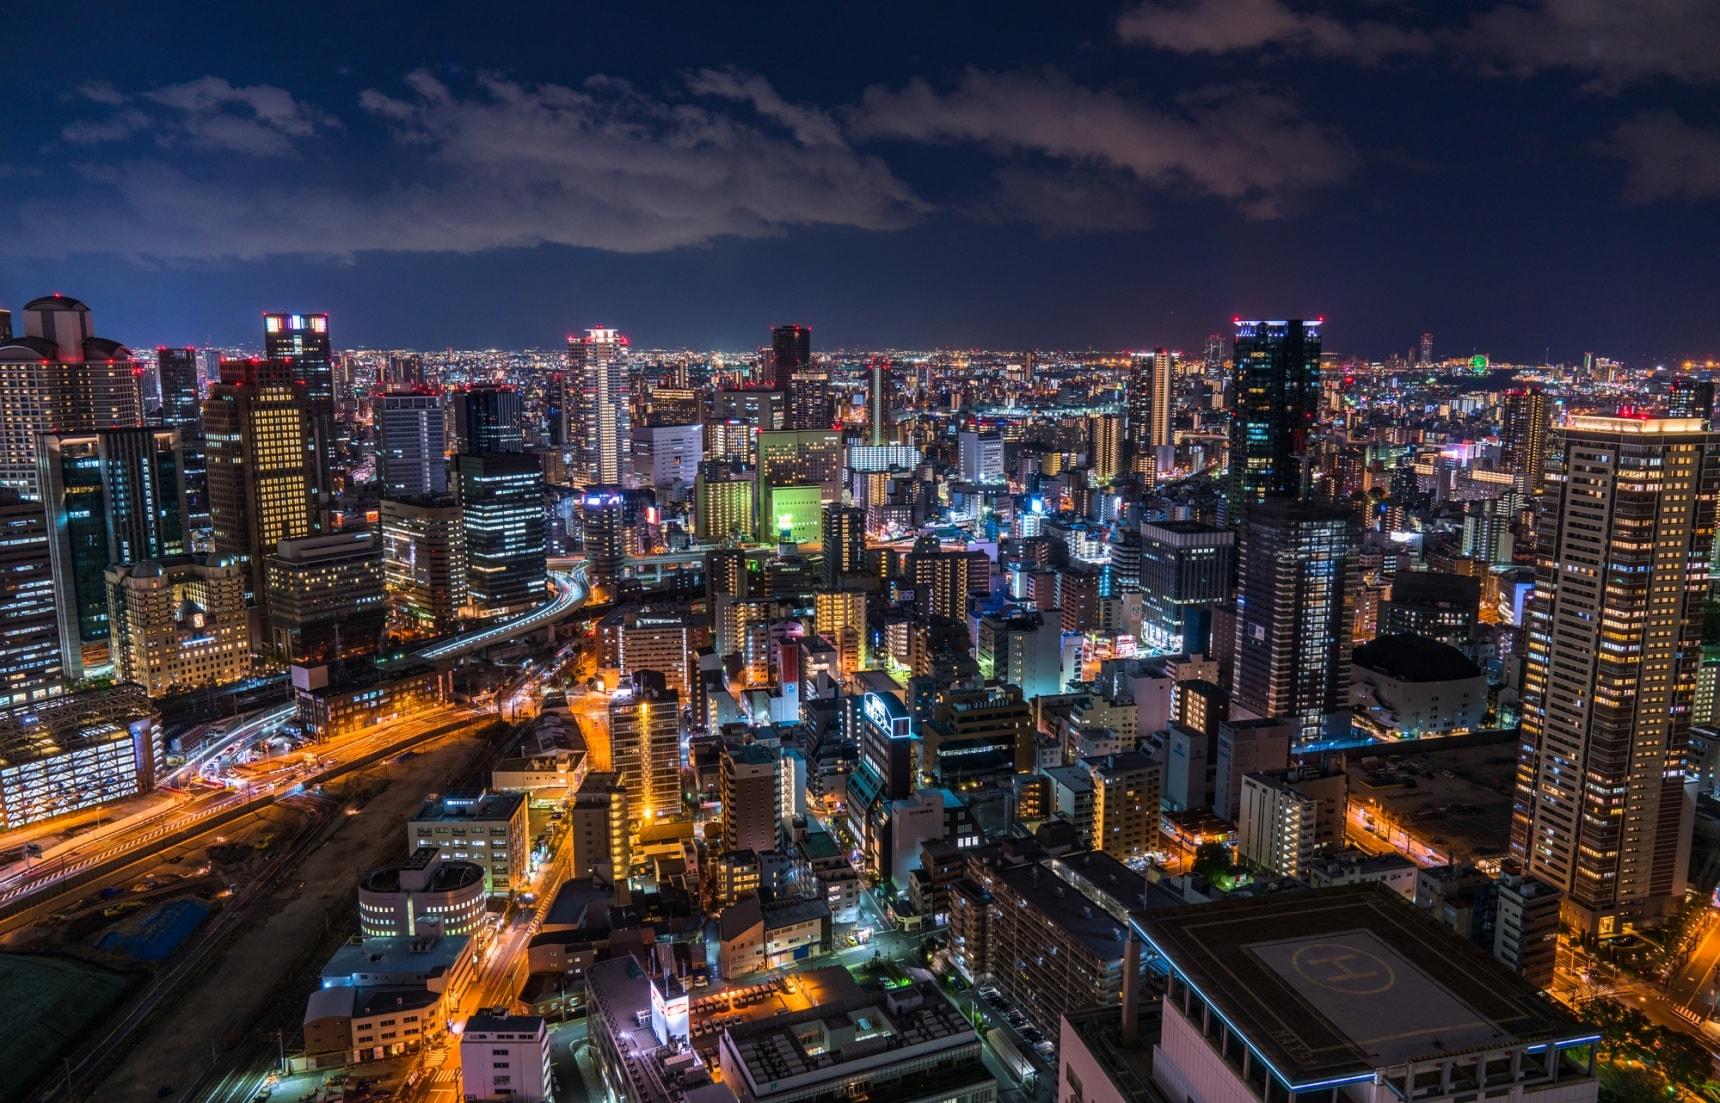 Osaka: 7 Best Neighborhoods for Your Stay